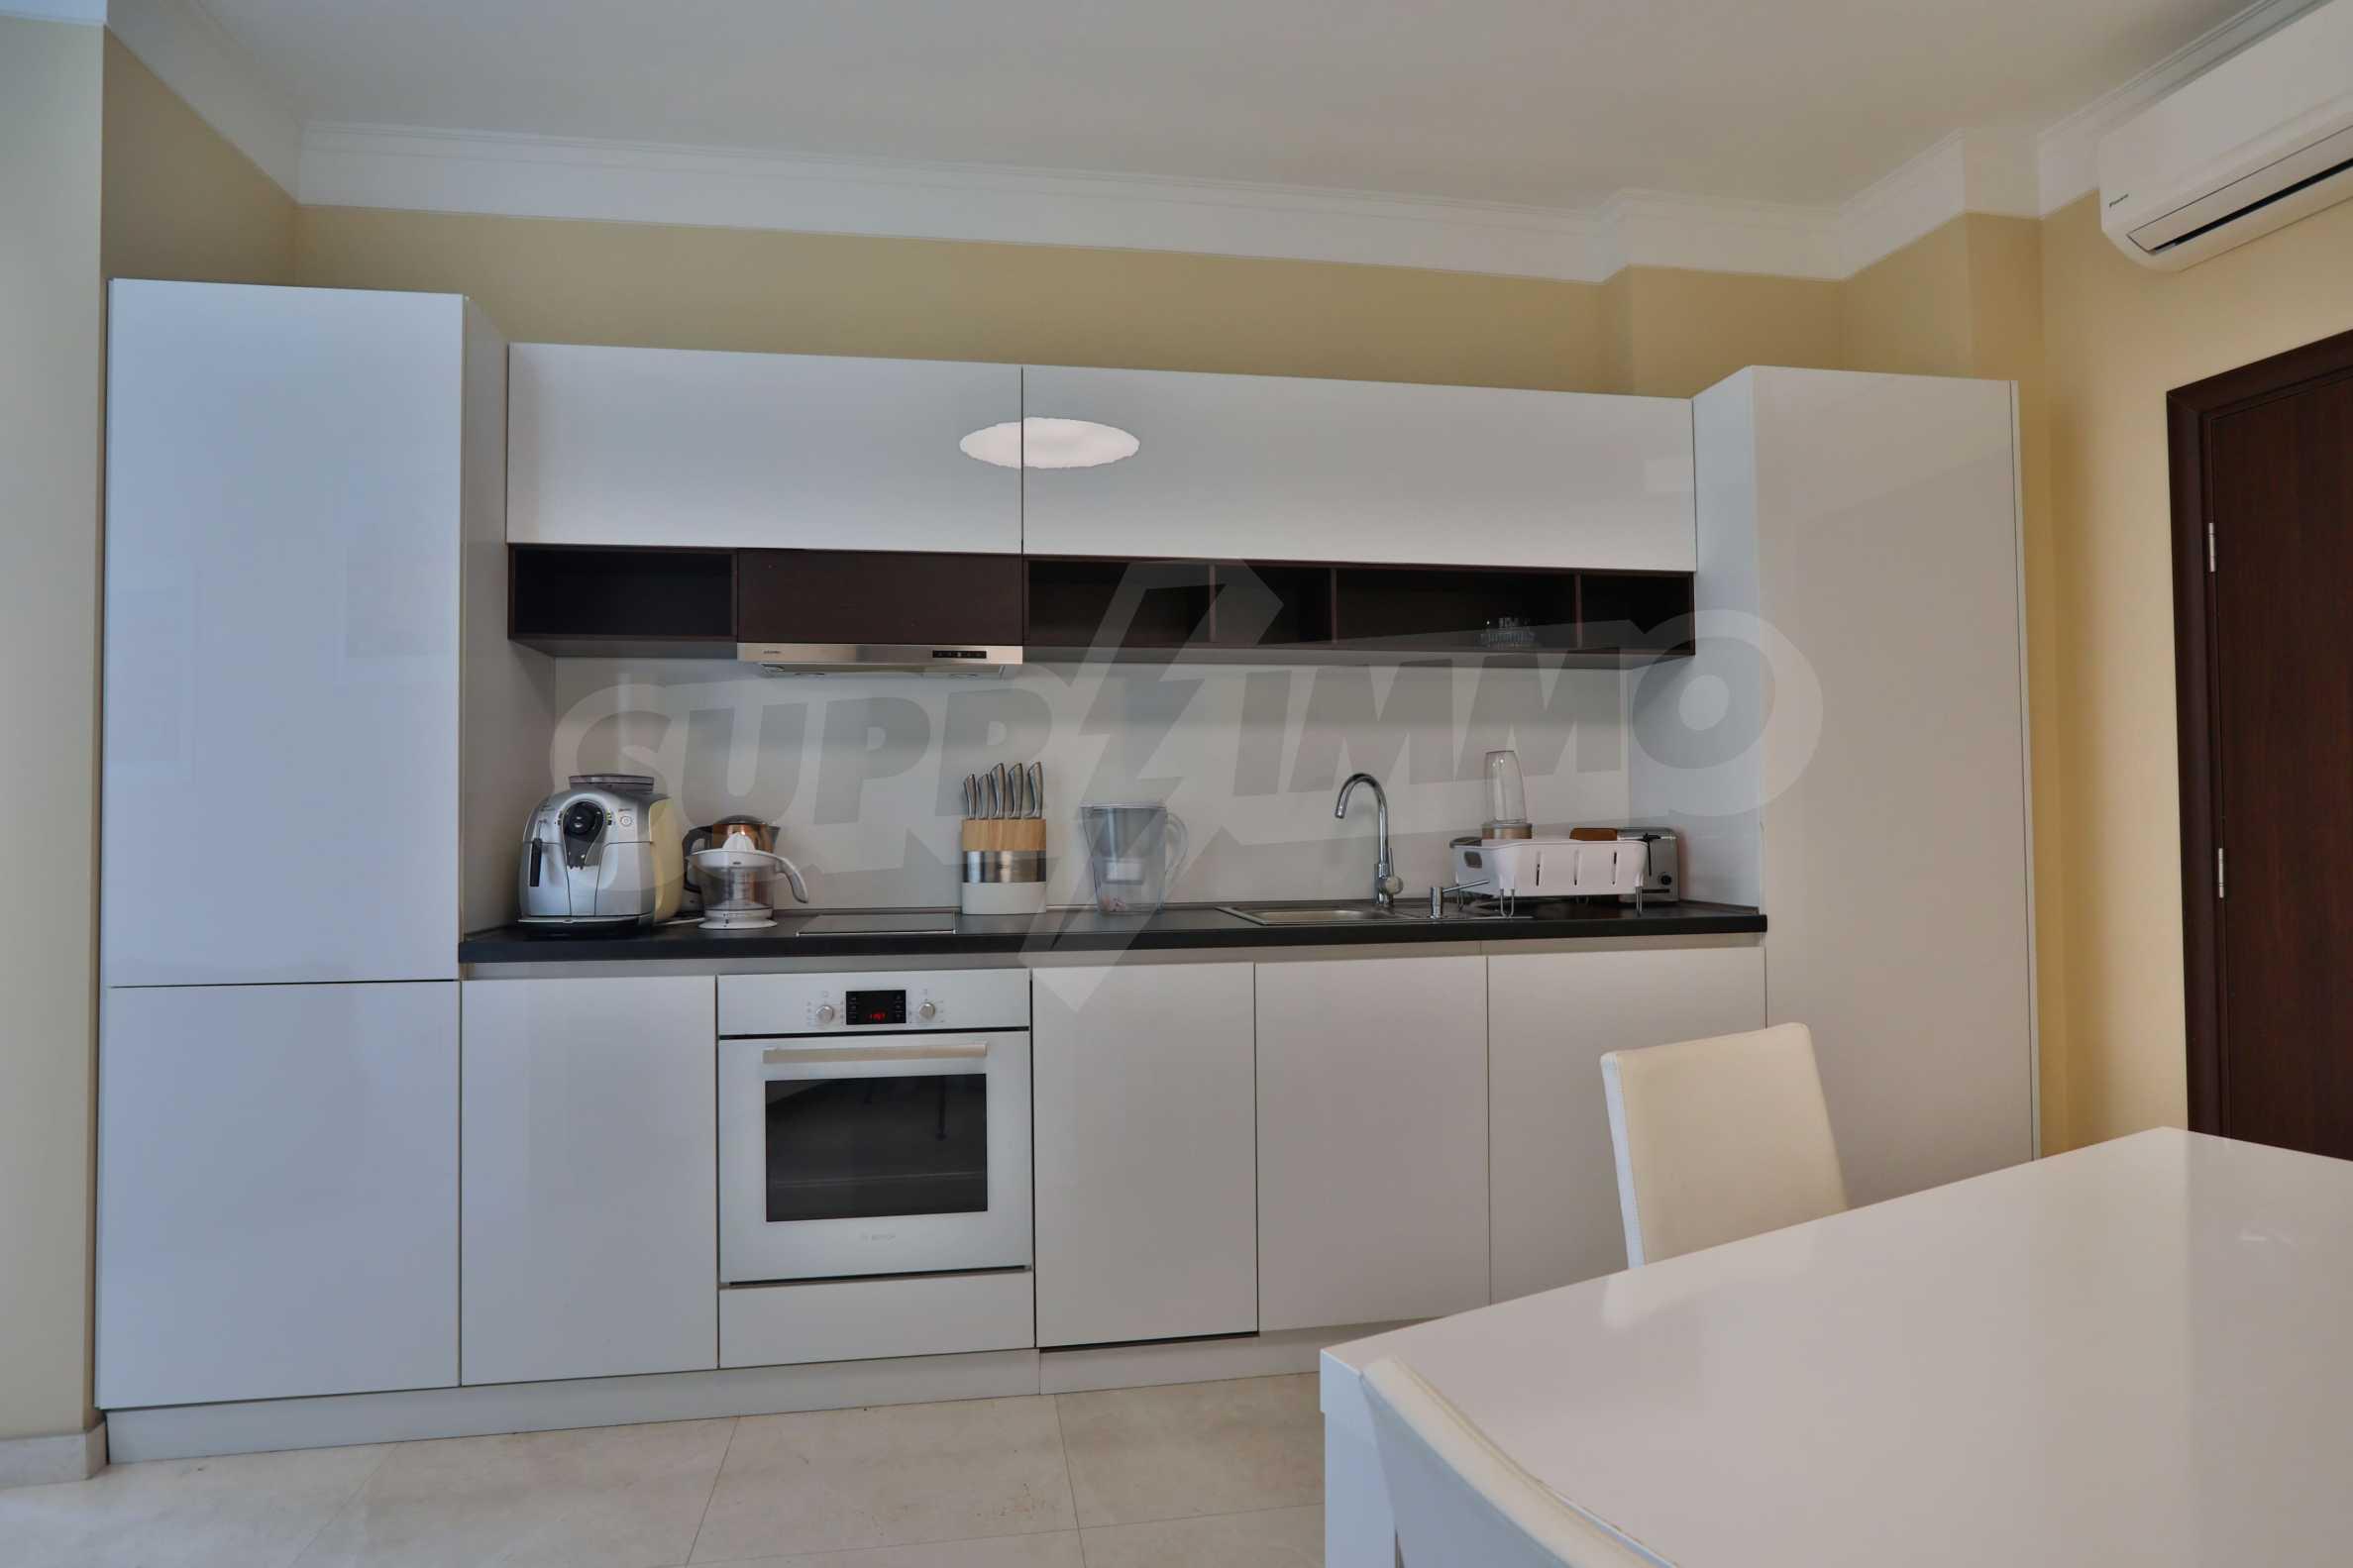 Дизайнерски тристаен апартамент под наем за летен сезон в резиденция Belle Époque в Лозенец 5